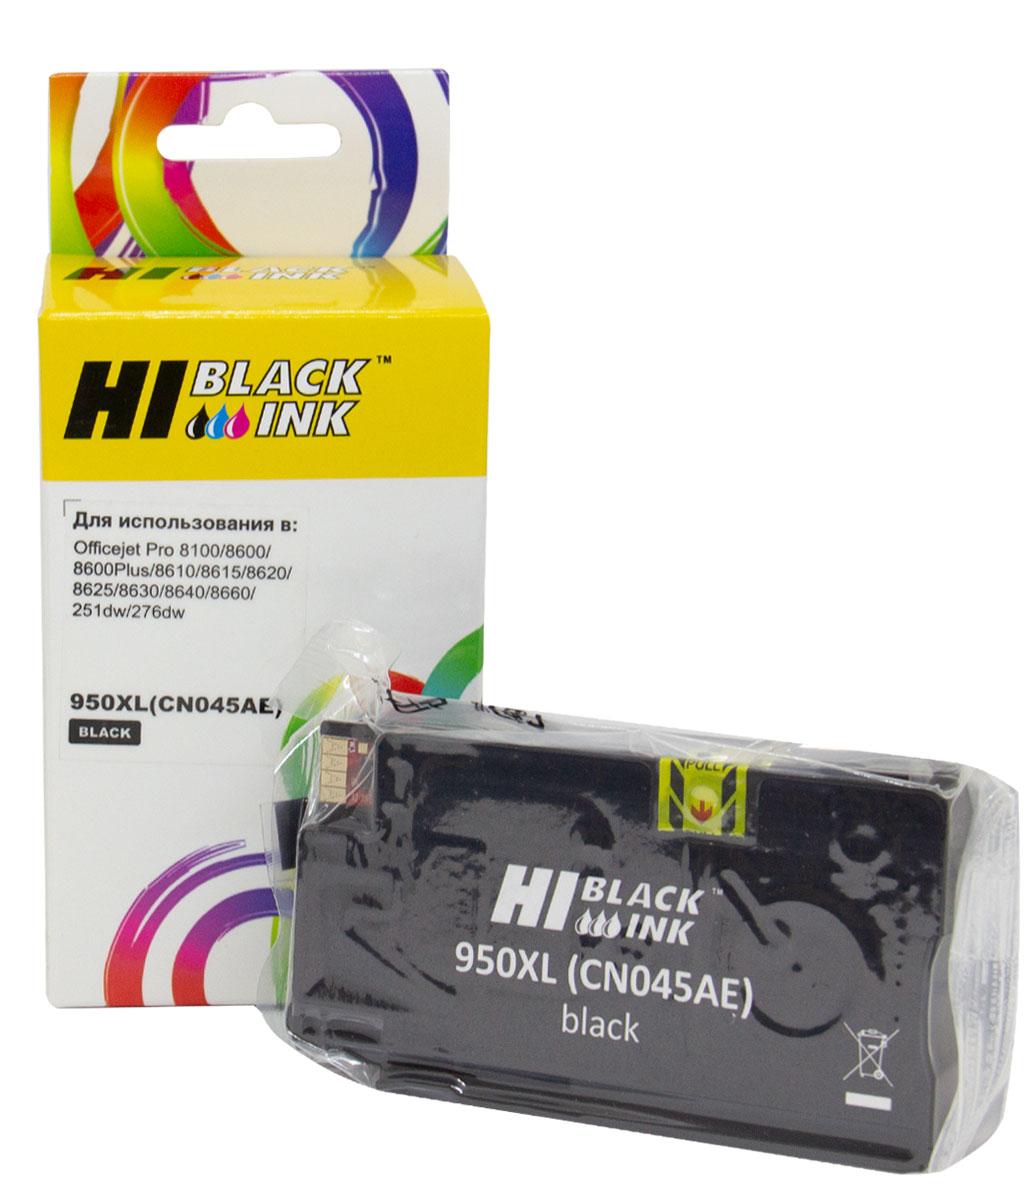 Картридж Hi-Black (HB-CN045AE) для HP Officejet Pro 8100/8600, №950XL, Bk